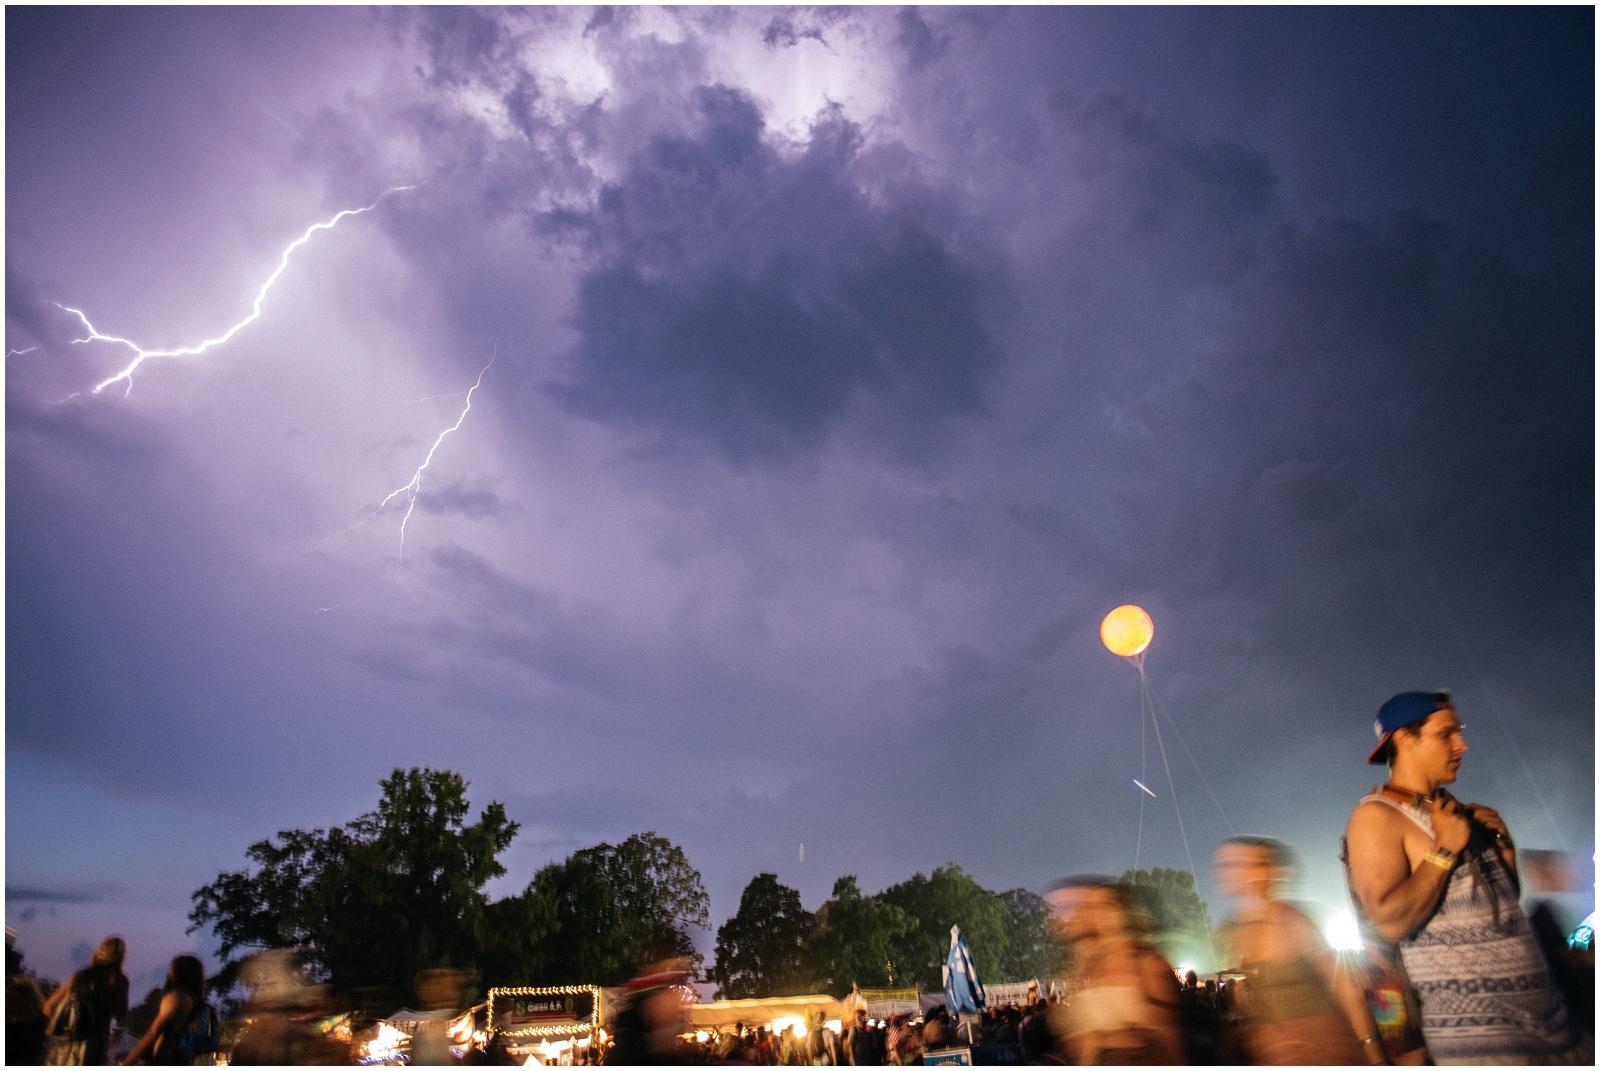 Photojournalist shot of lightning at Bonnaroo 2016